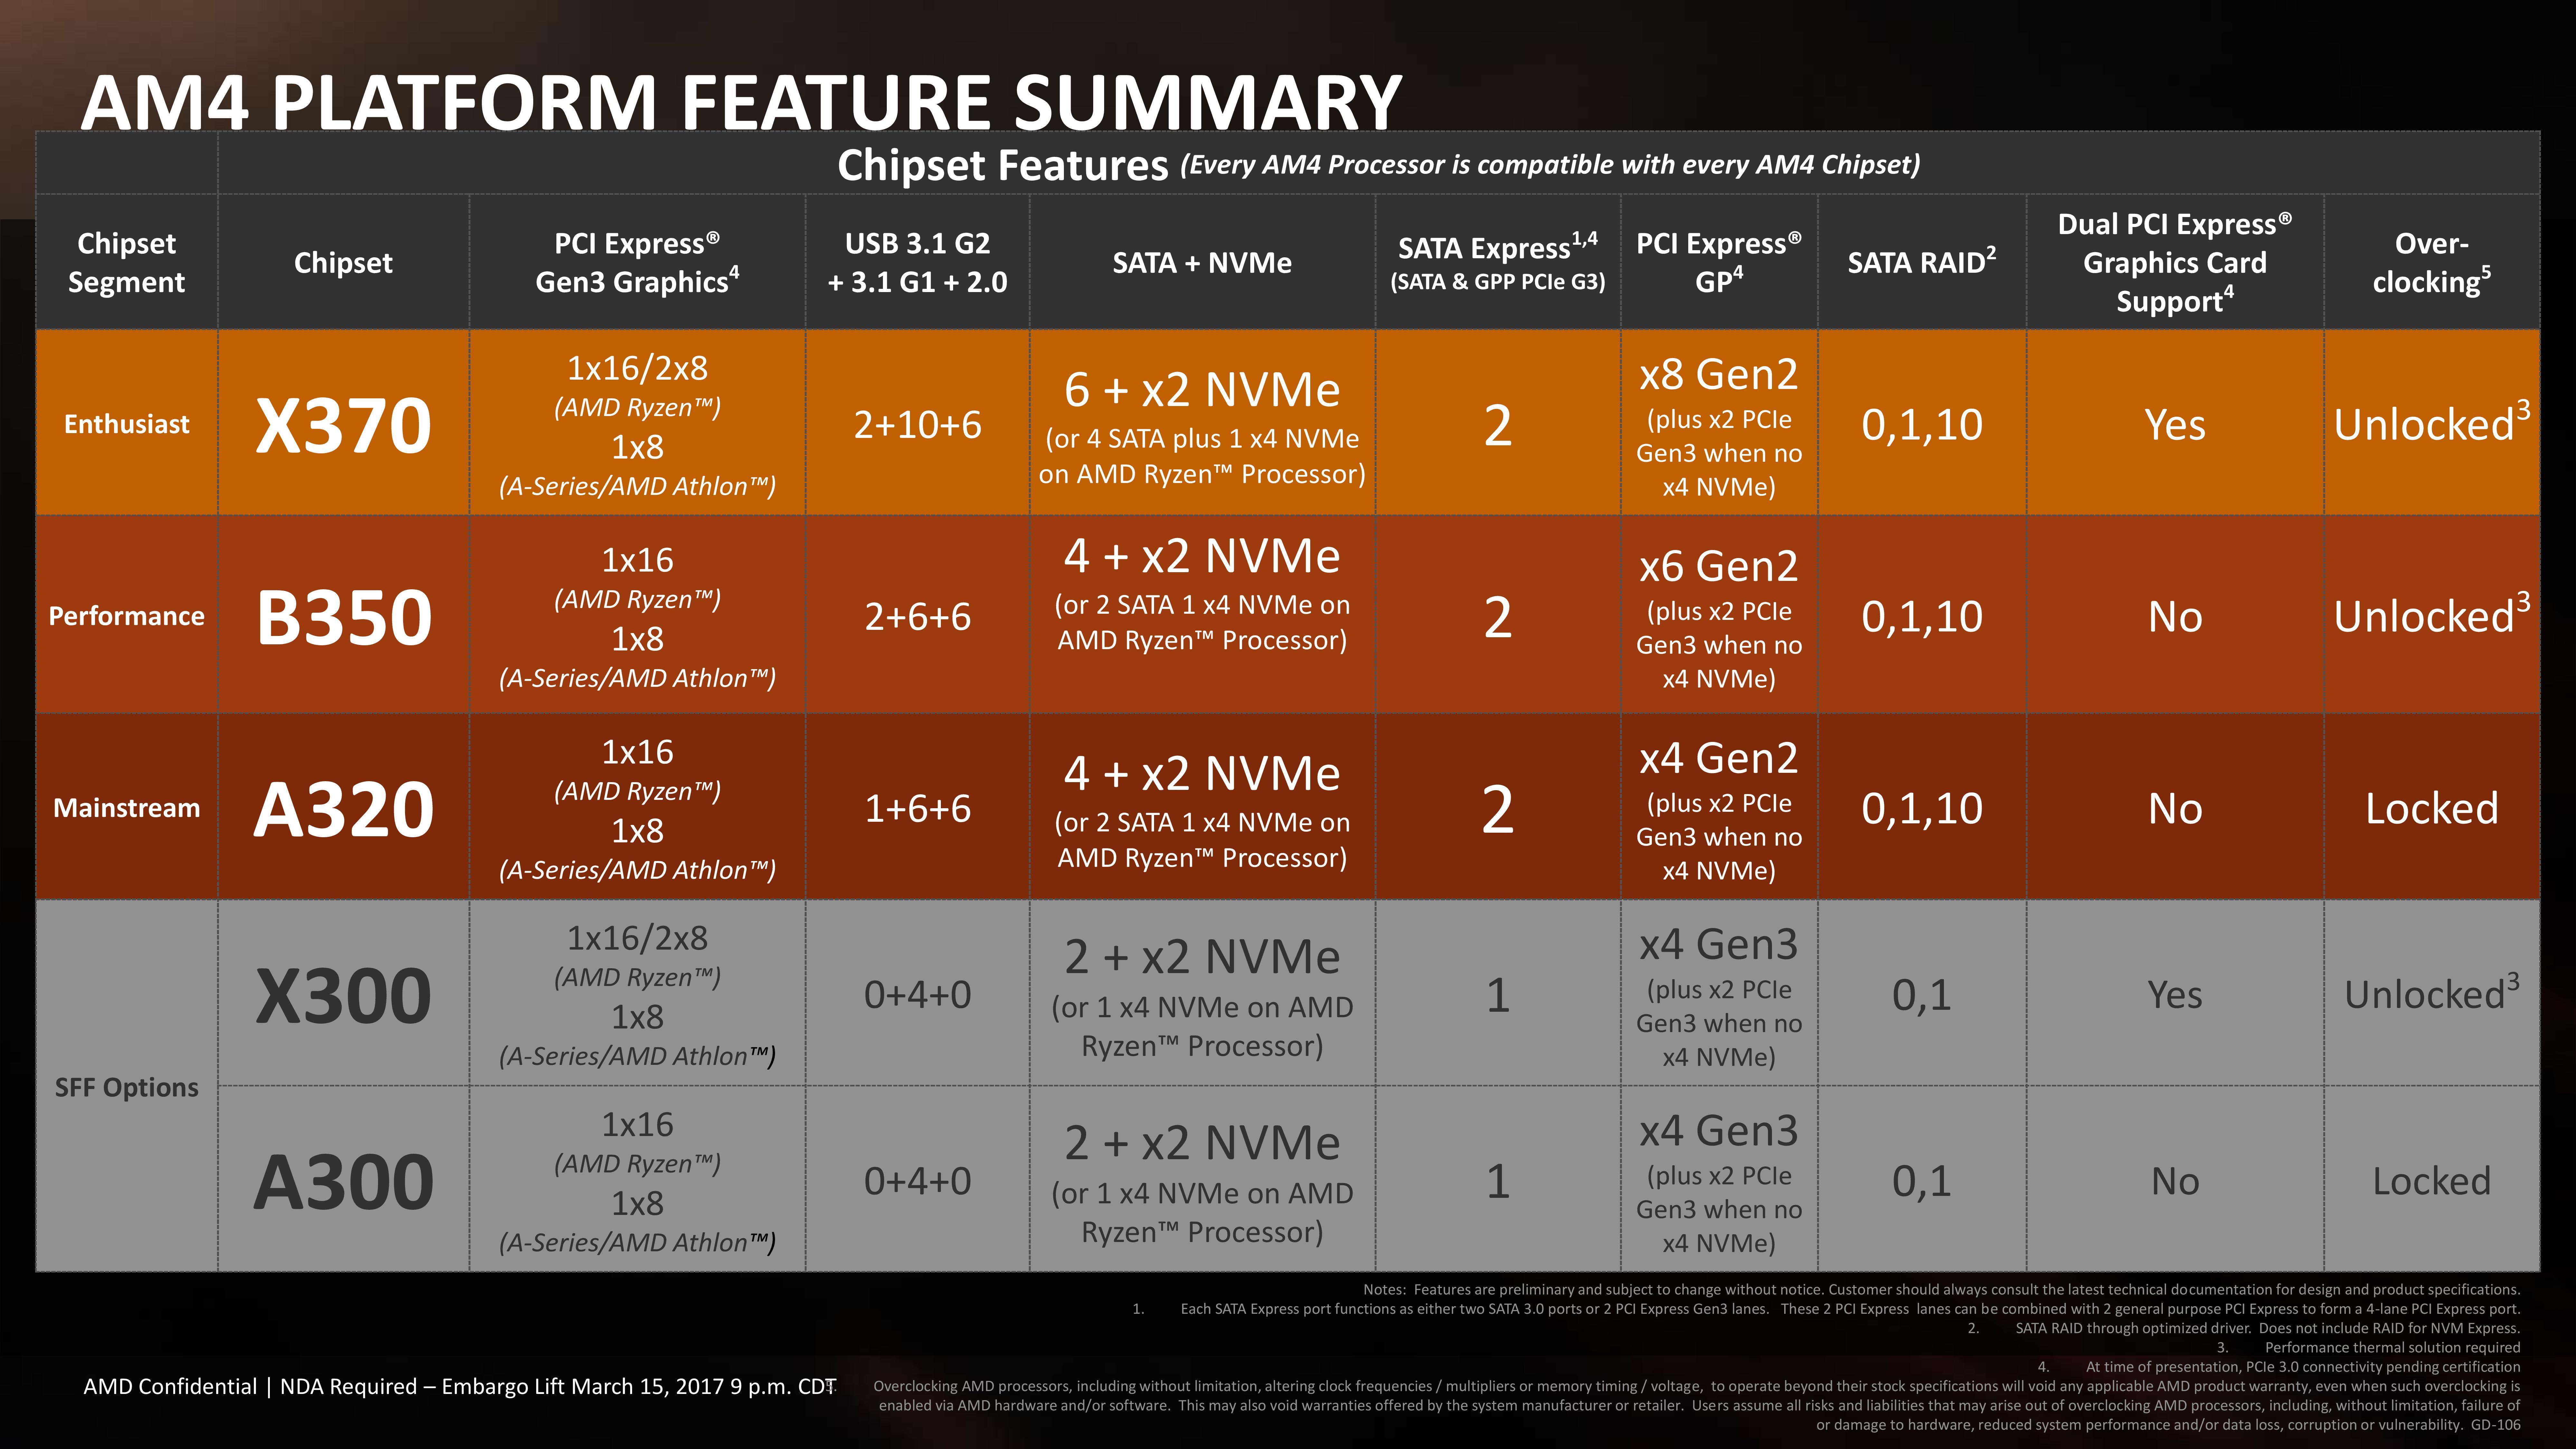 The AMD Ryzen 5 1600X Vs Core I5 Review Twelve Threads Vs